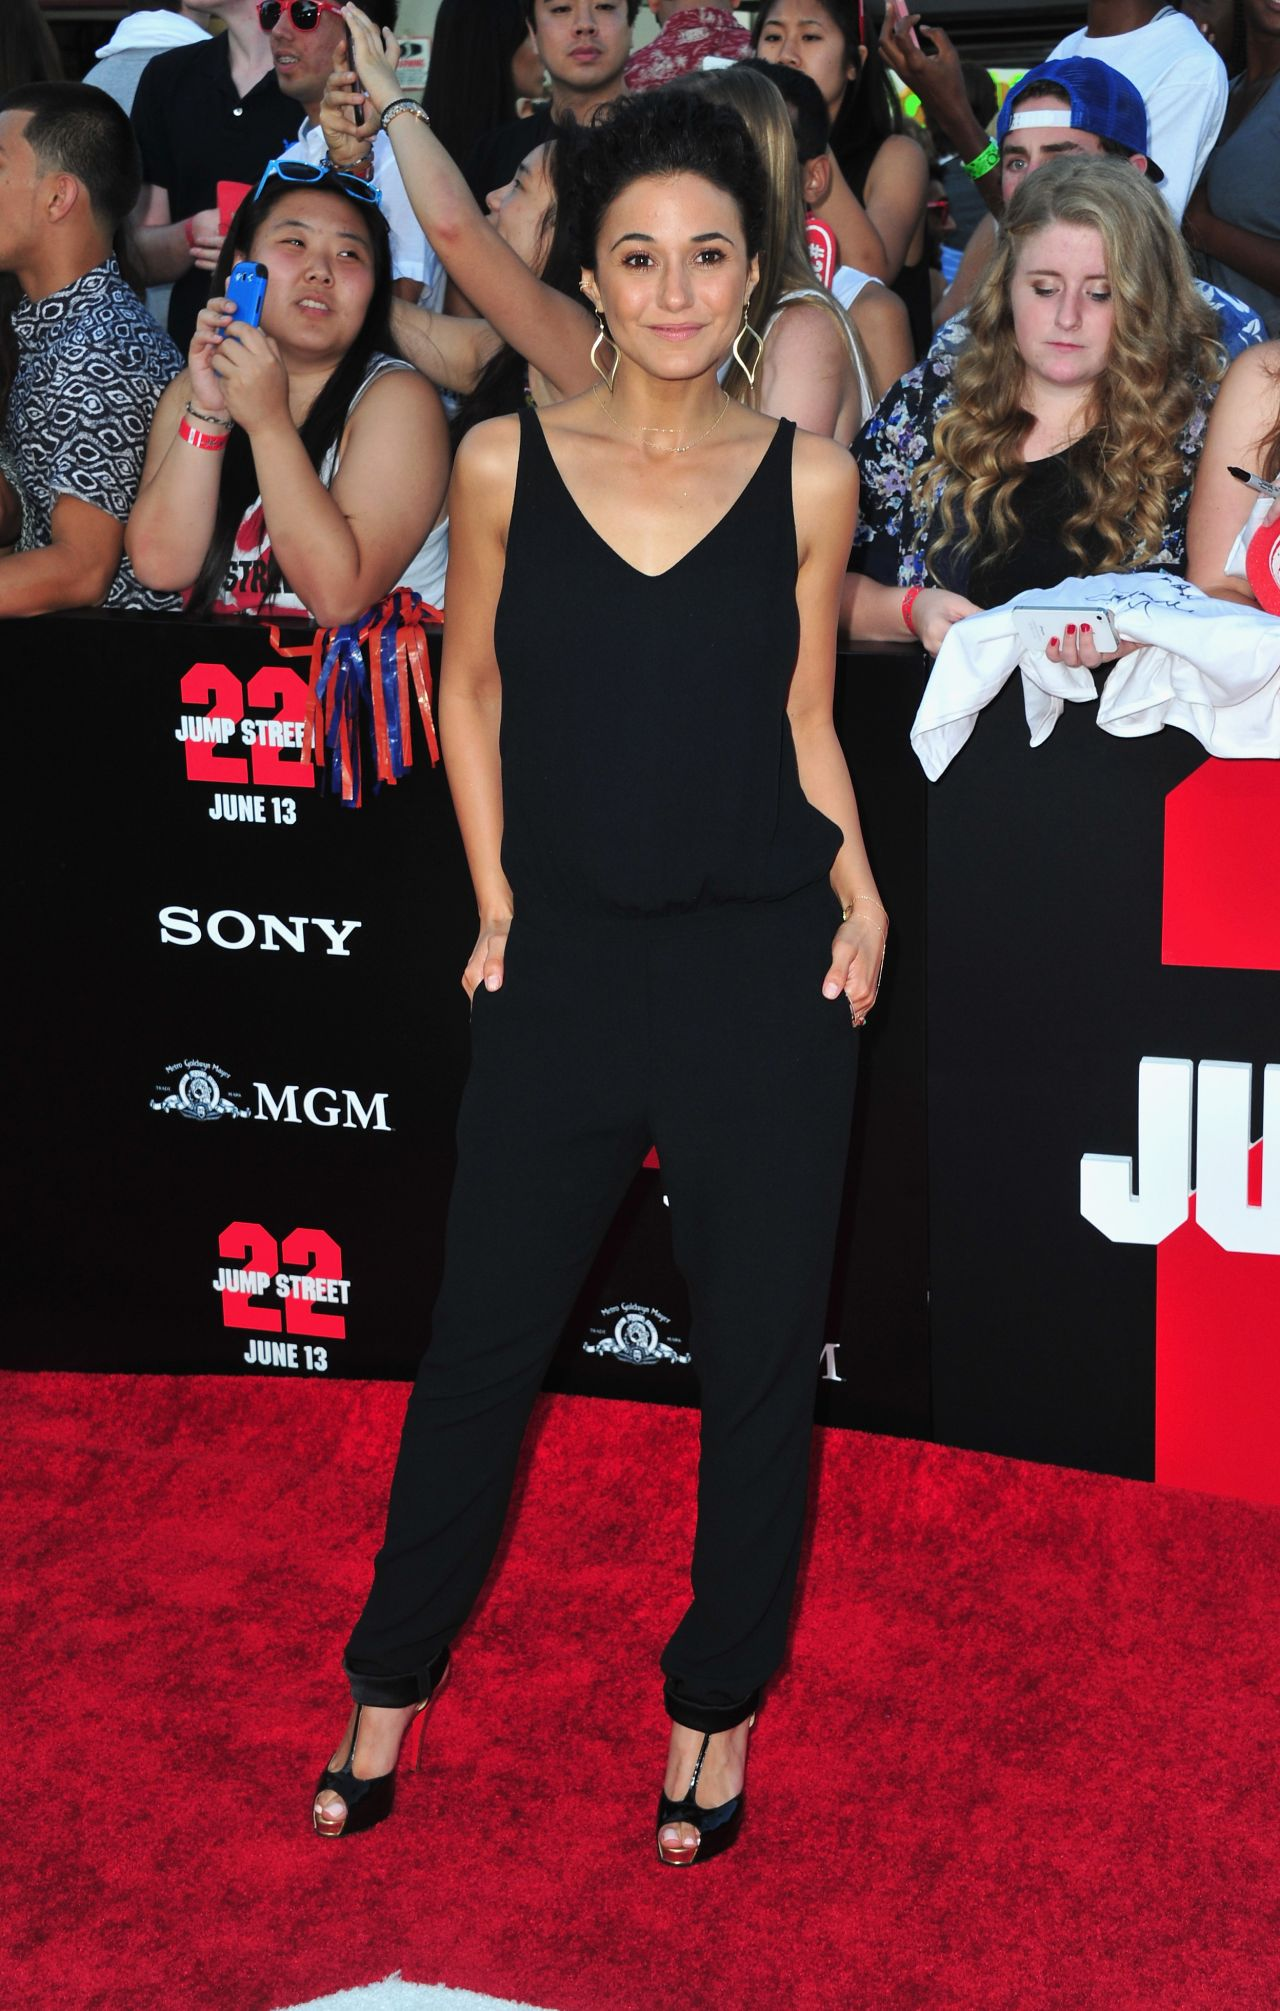 22 JUMP STREET Premiere in Westwood – Emmanuelle Chriqui